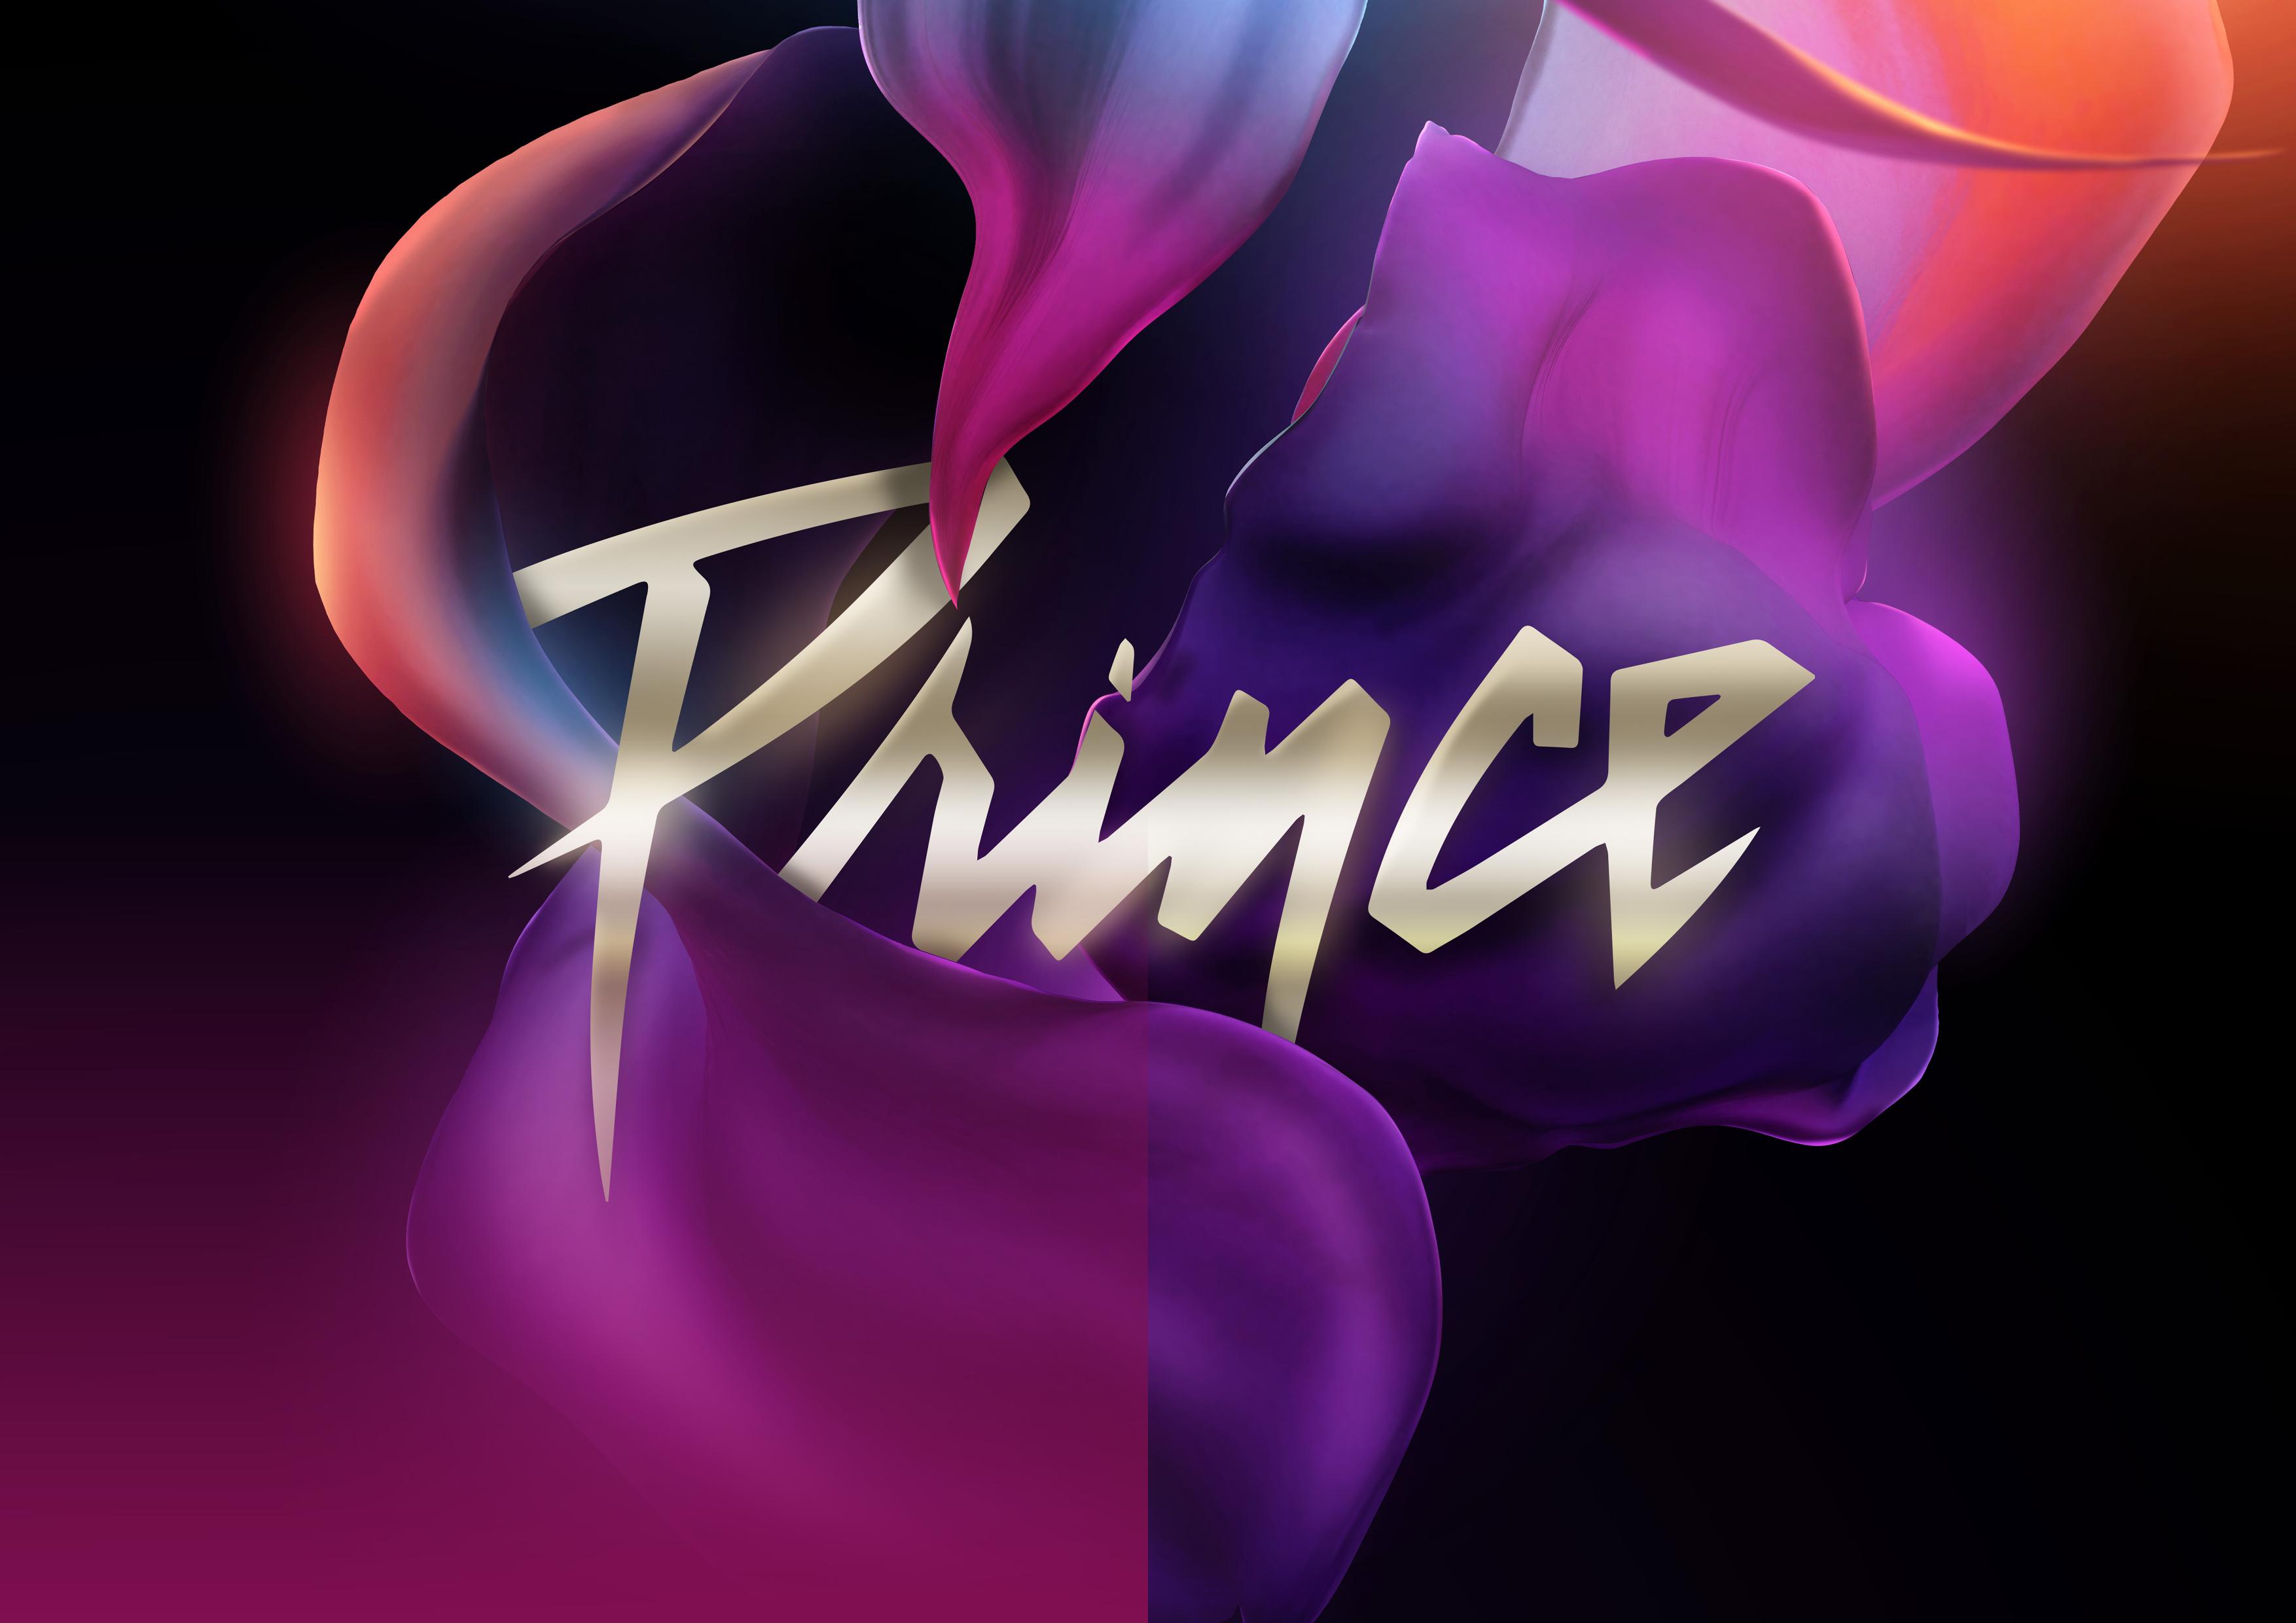 A symphonic tribute to Prince